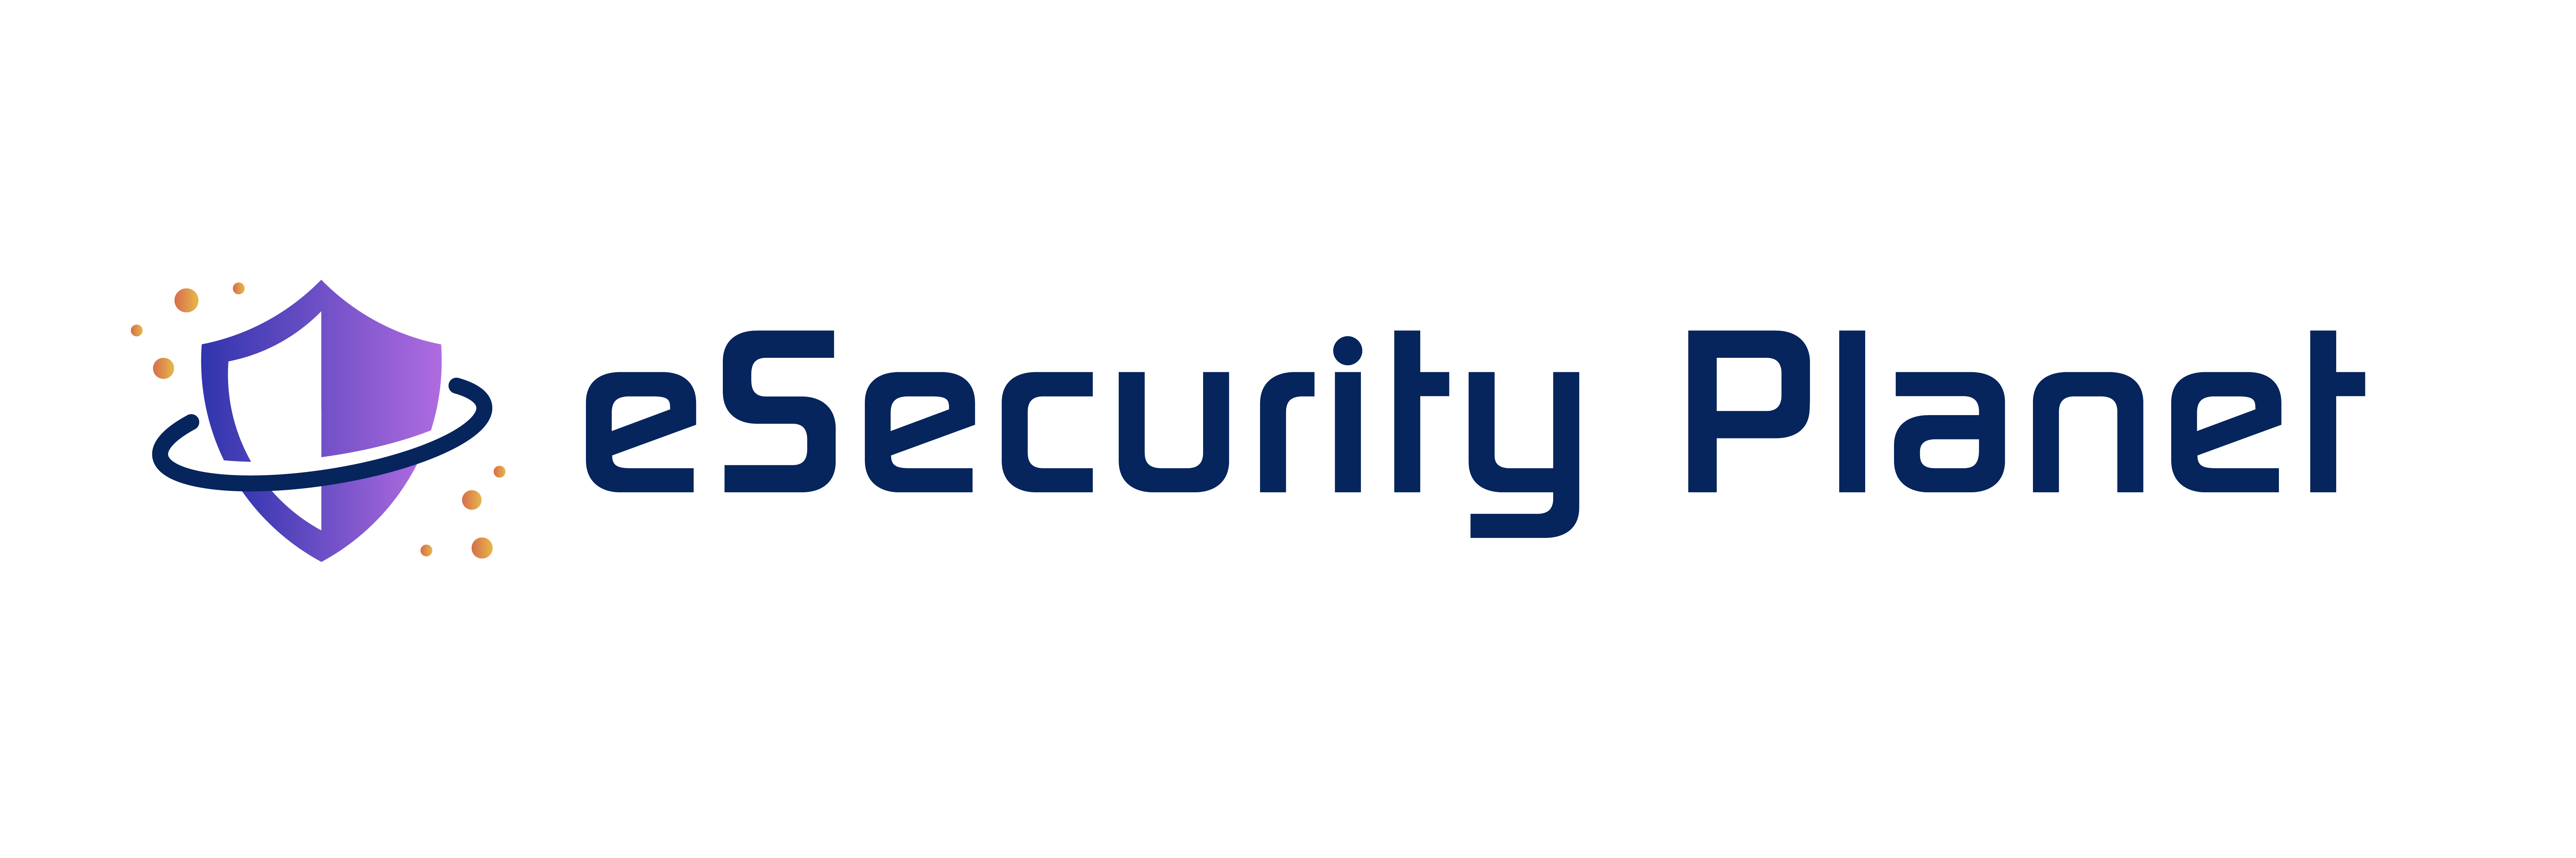 eSecurityPlanet